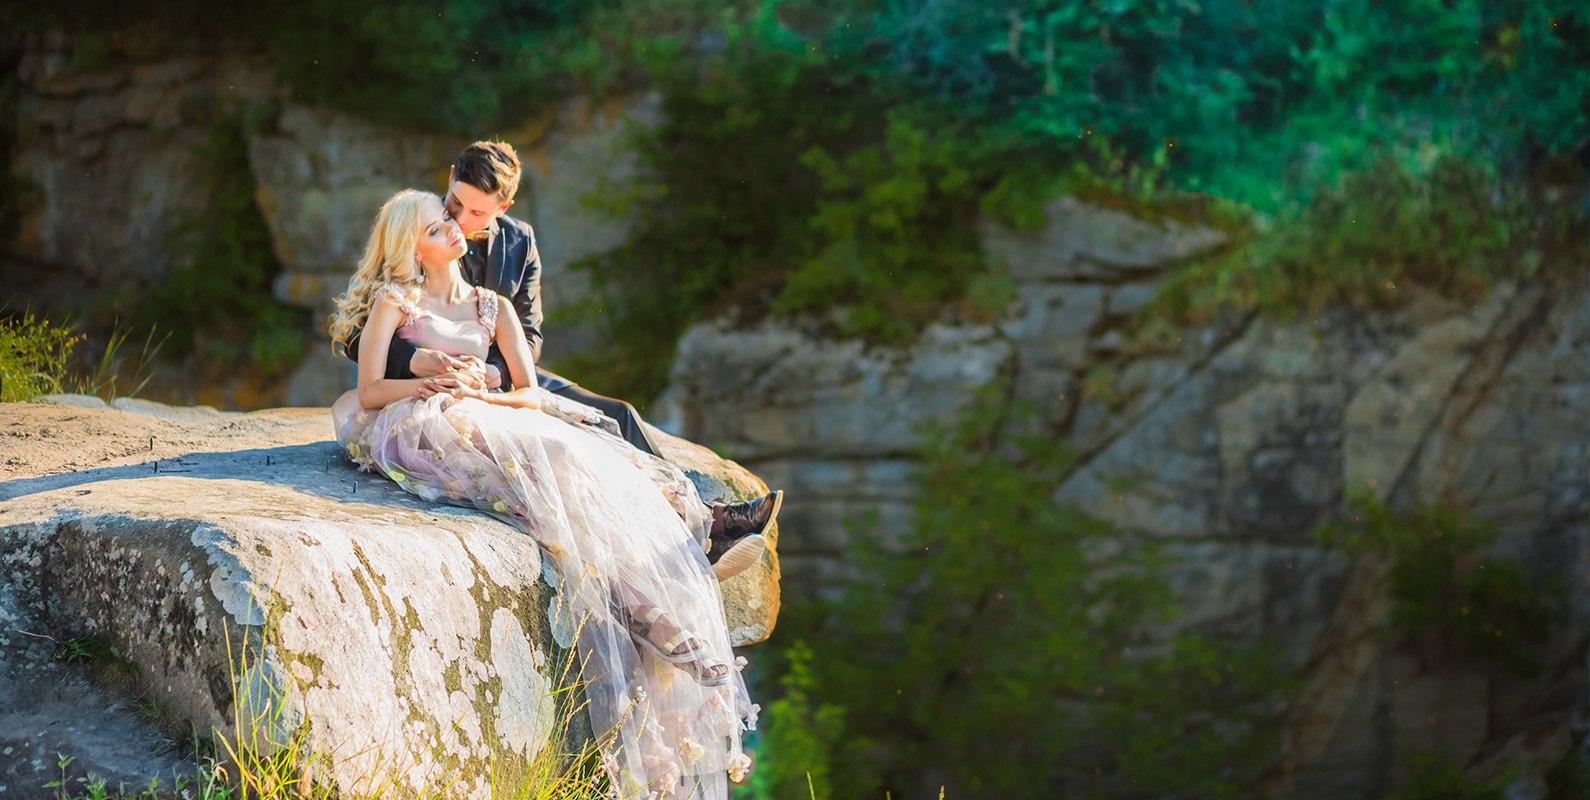 EYuevuCRp9w - Нужна ли репетиция свадьбы?